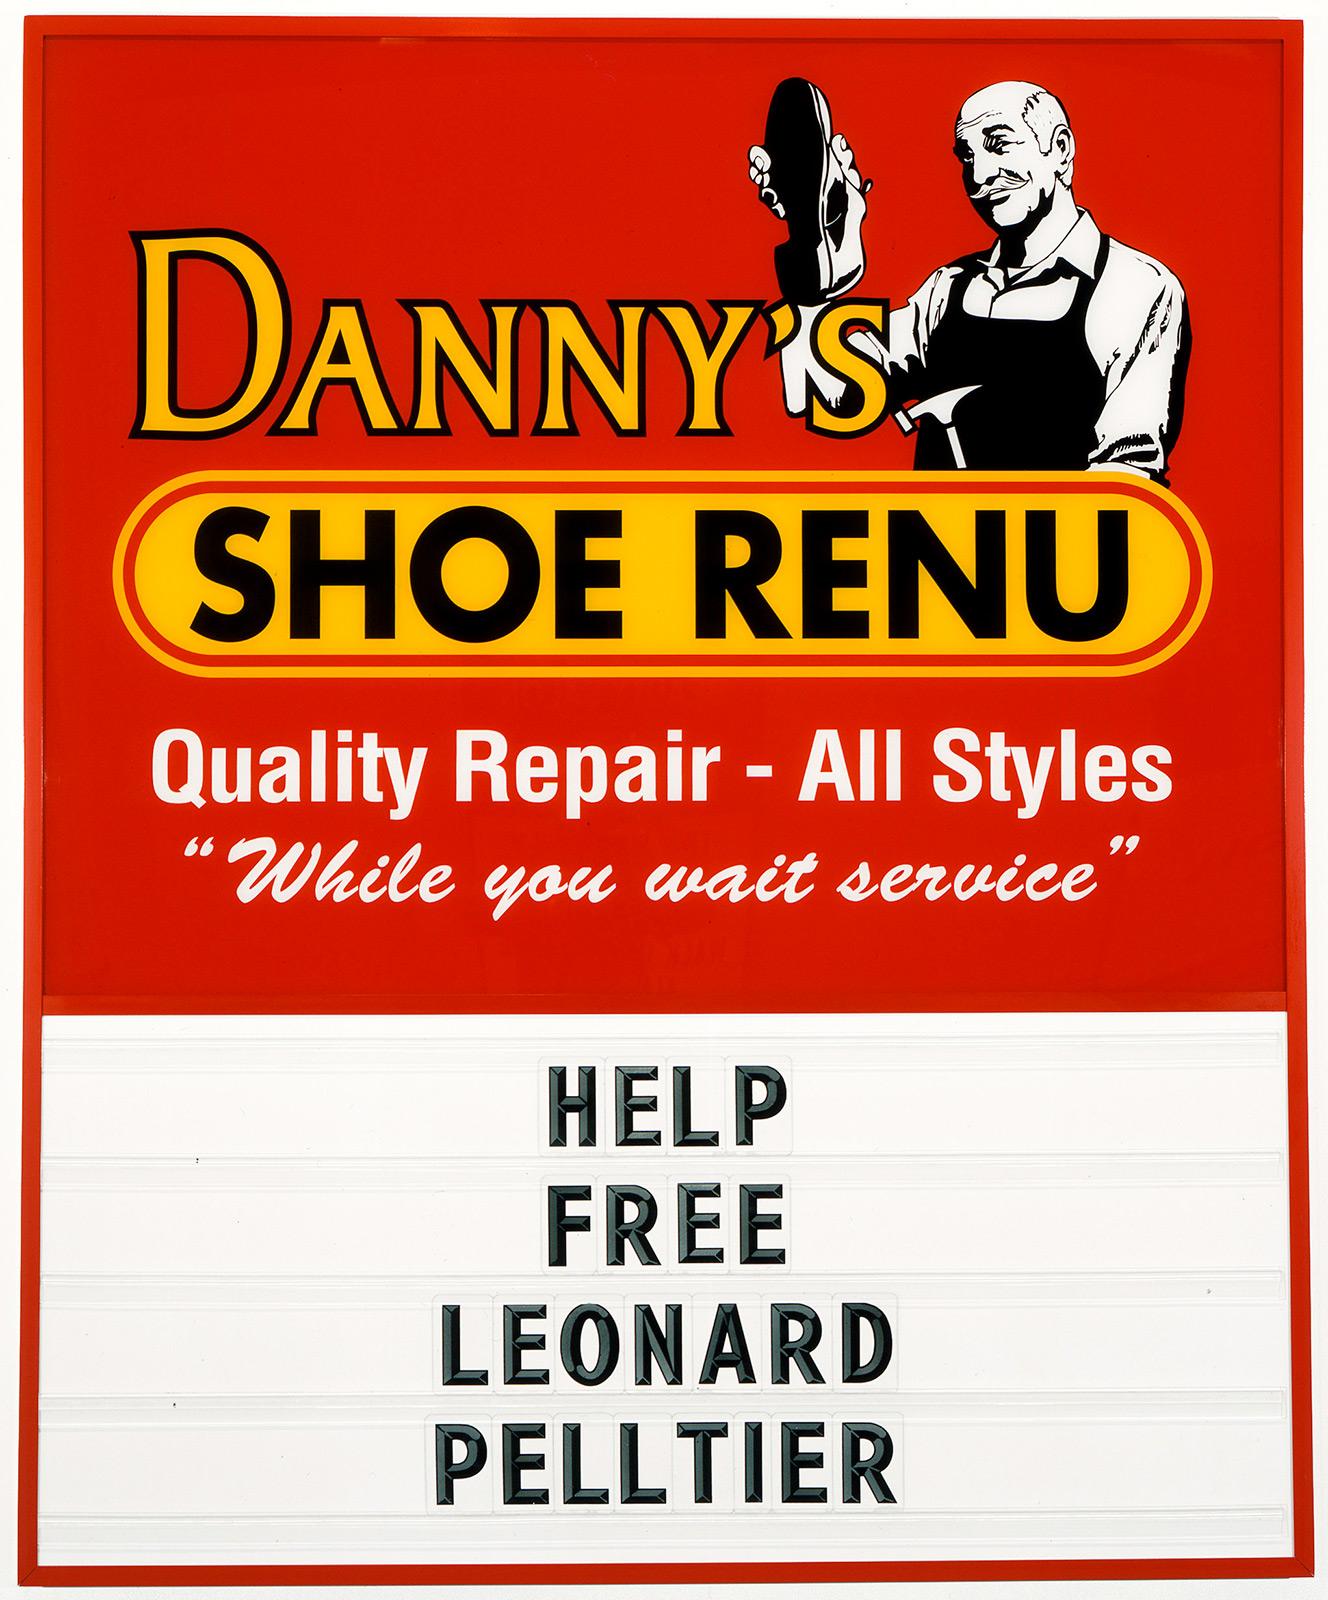 Danny's Shoe Renu, 2001